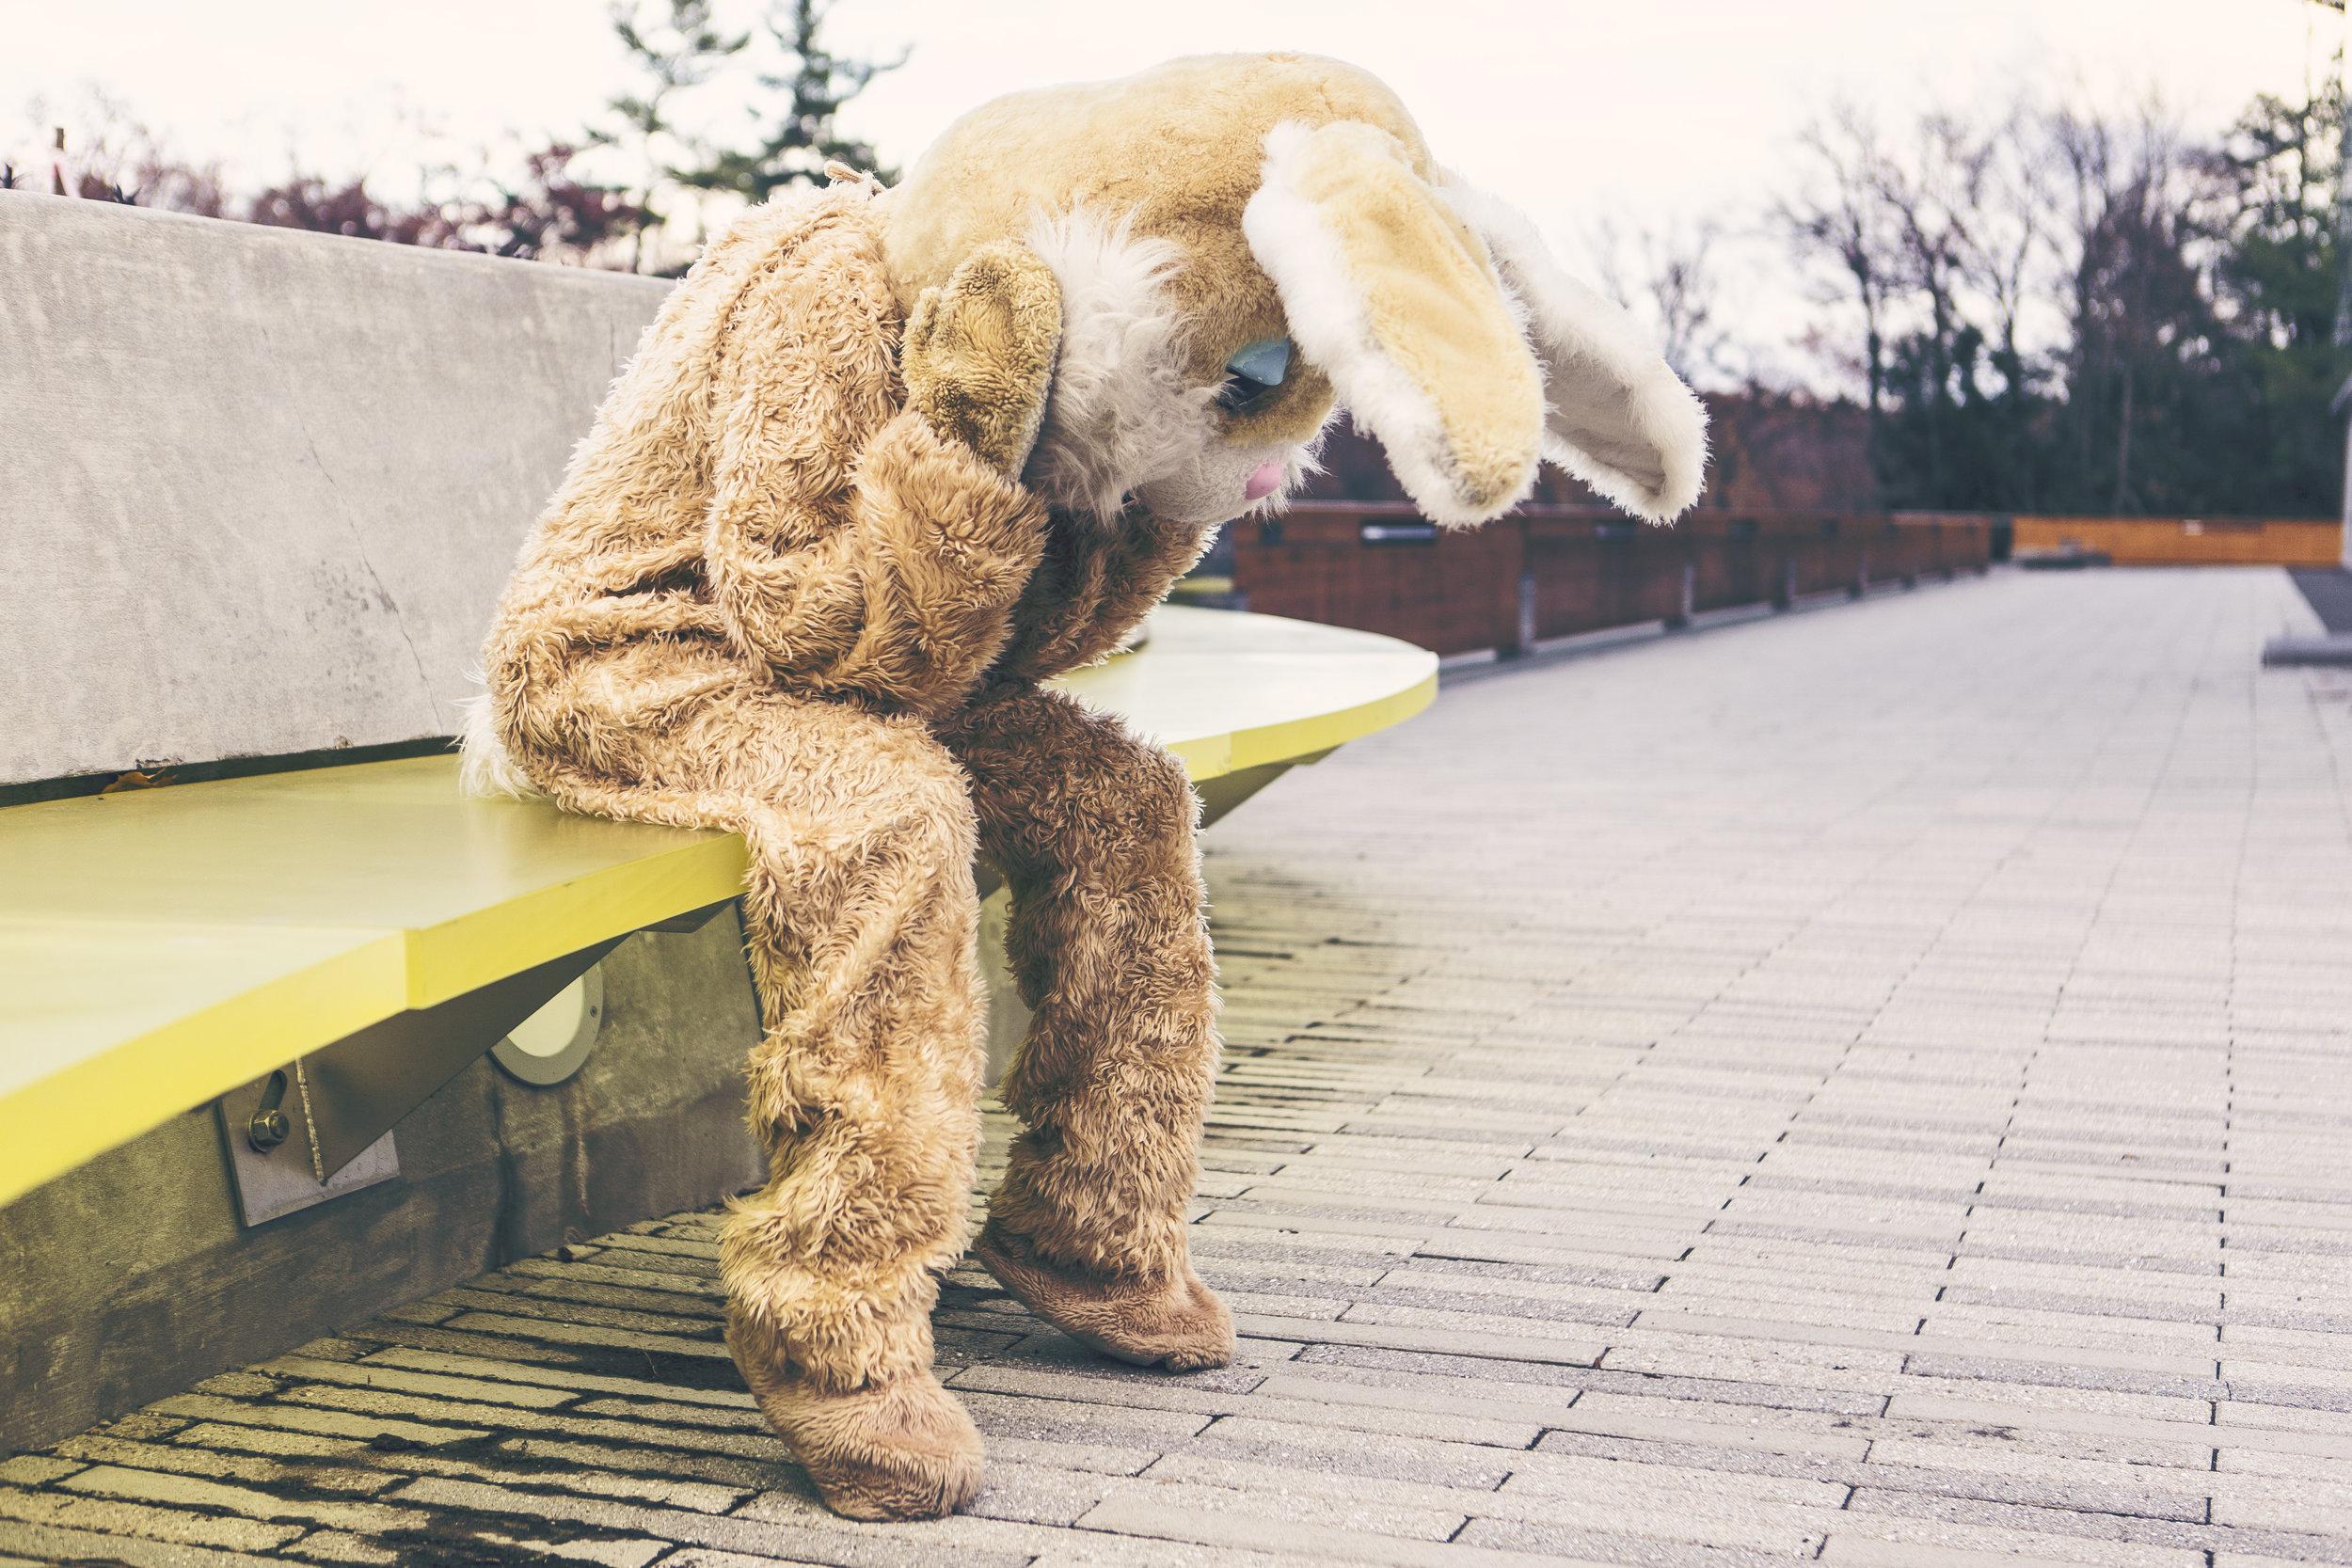 gratisography-sad-bunny.jpg